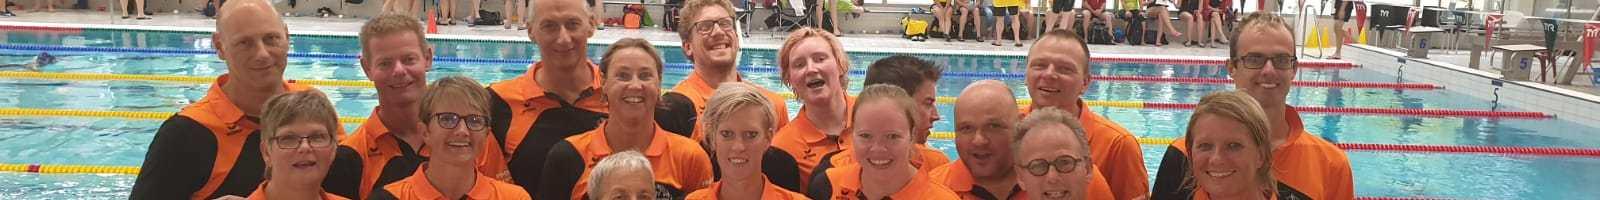 Masters Biesboschzwemmers 'trappen' seizoen af